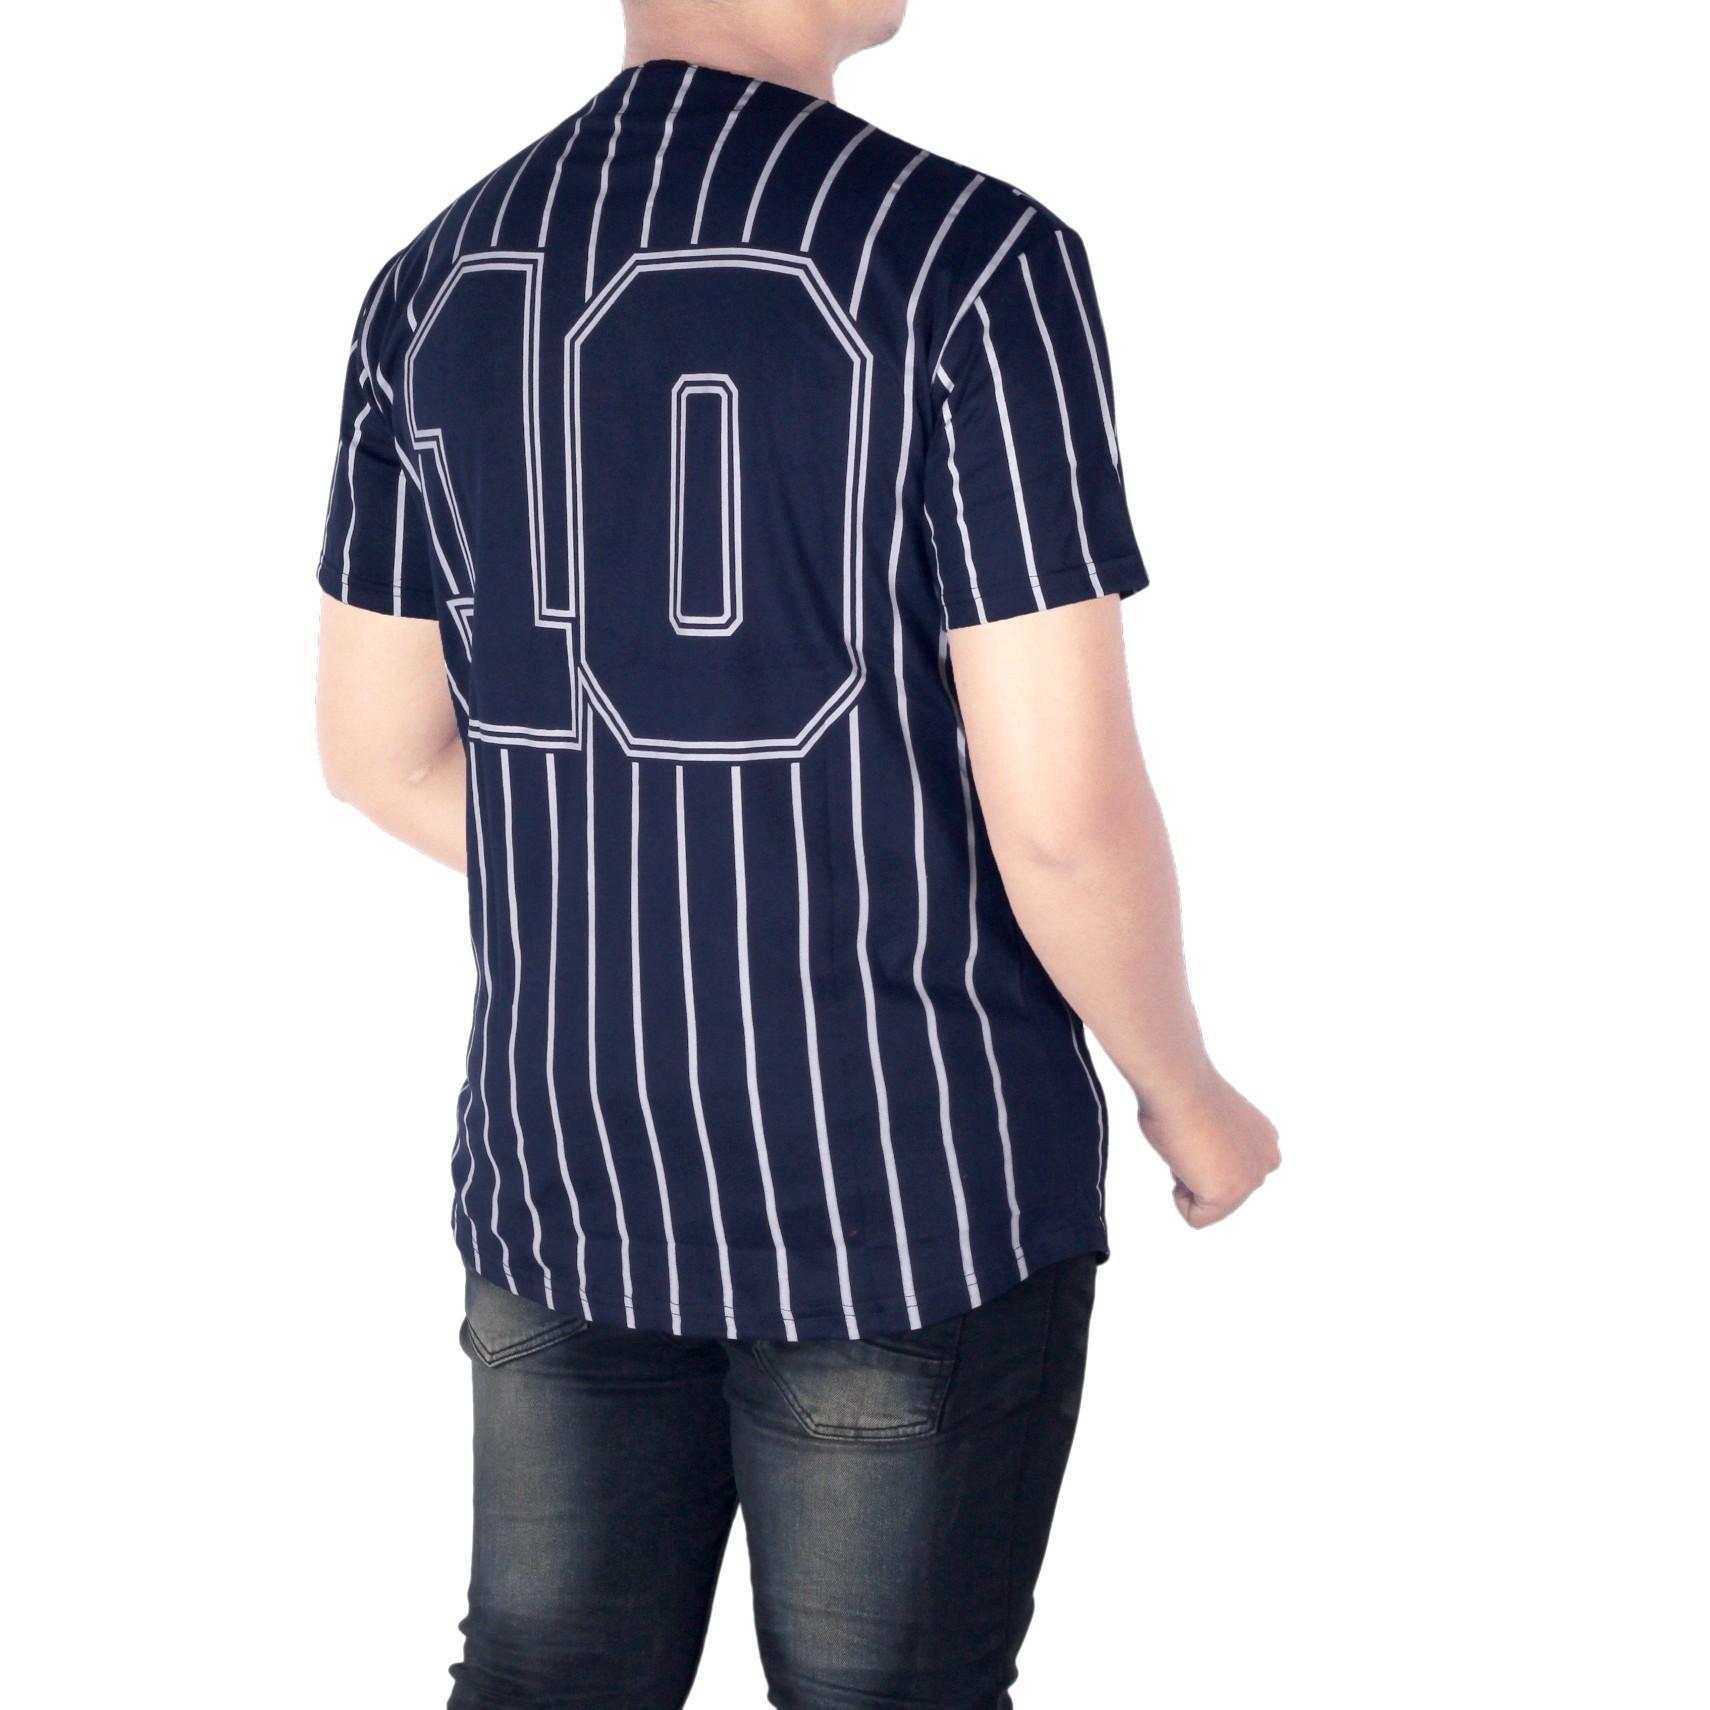 Dgm_Fashion1 baju kaos Distro BASEBALL Navy Premium/ Baju Kaos Distro Baseball Hitam dan Putih/Kaos DIstro/Kaos Pria/Kaos Oblong/Kaos Men/Kaos Young Lex/Kaos YOGS/Kaos Swag/Kaos Murah/Kaos COMBED/Baju Distro NS 5670